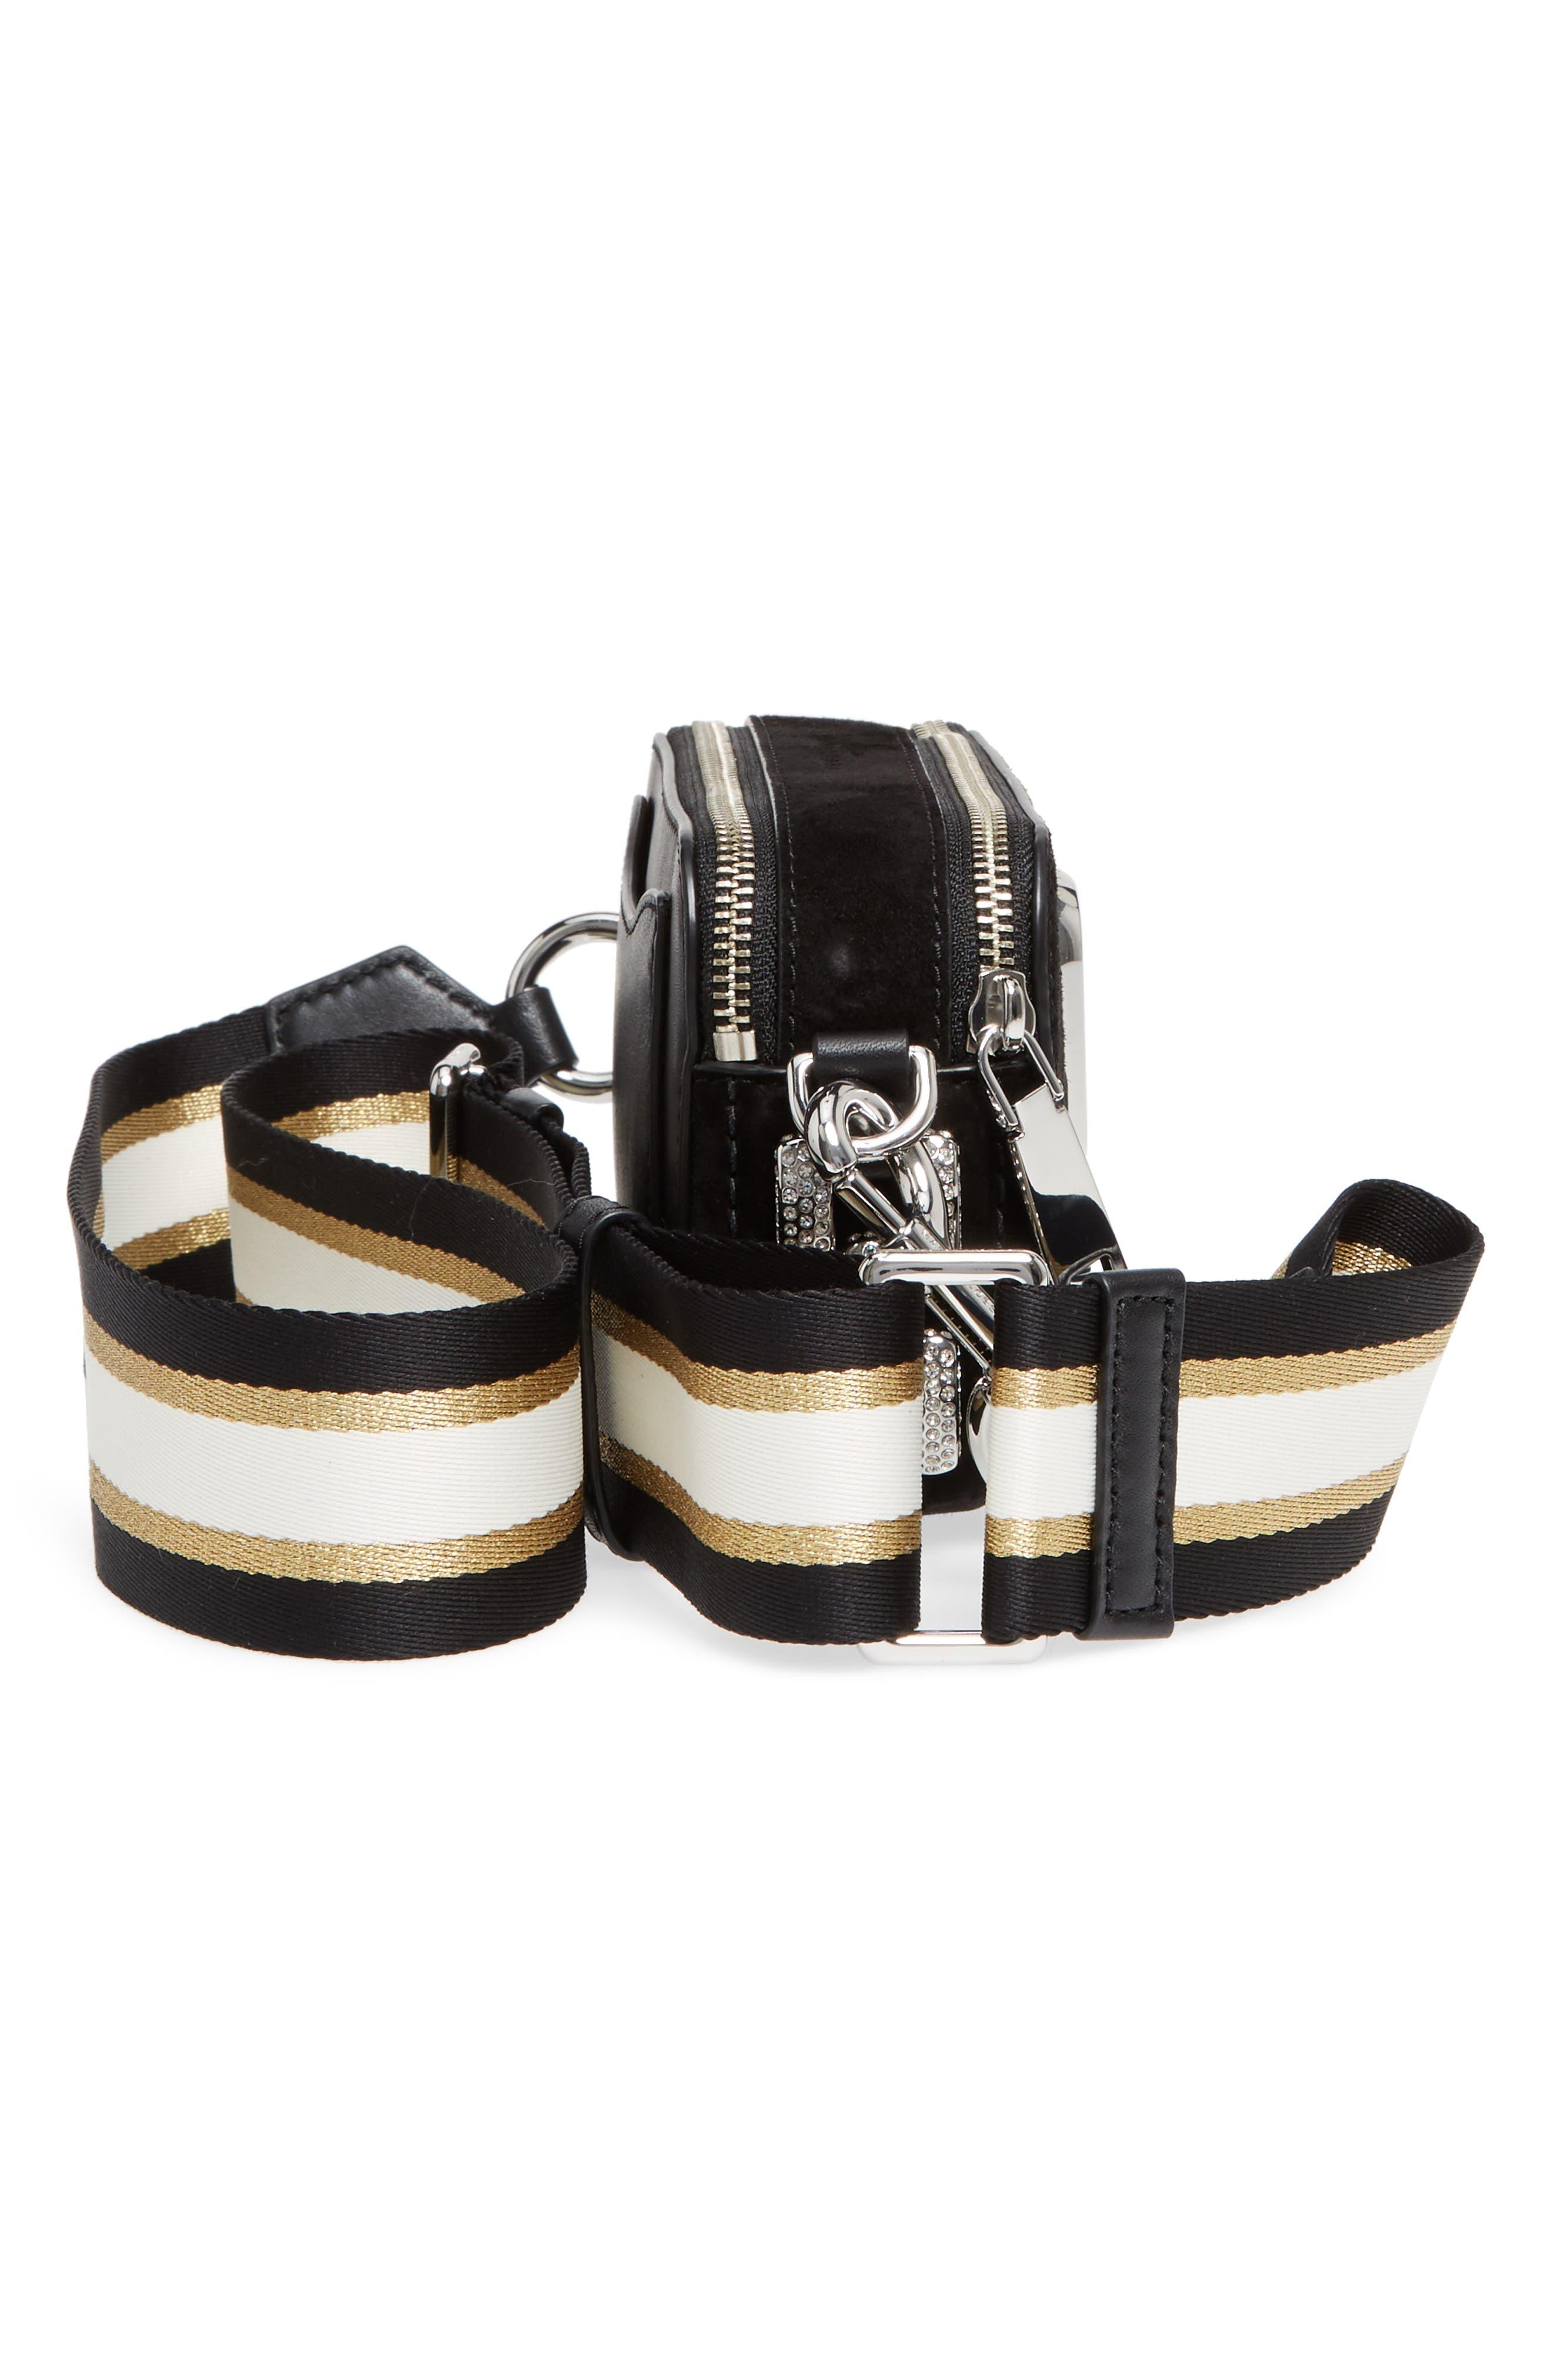 Snapshot Leather Pavé Chain Trim Crossbody Bag,                             Alternate thumbnail 5, color,                             001